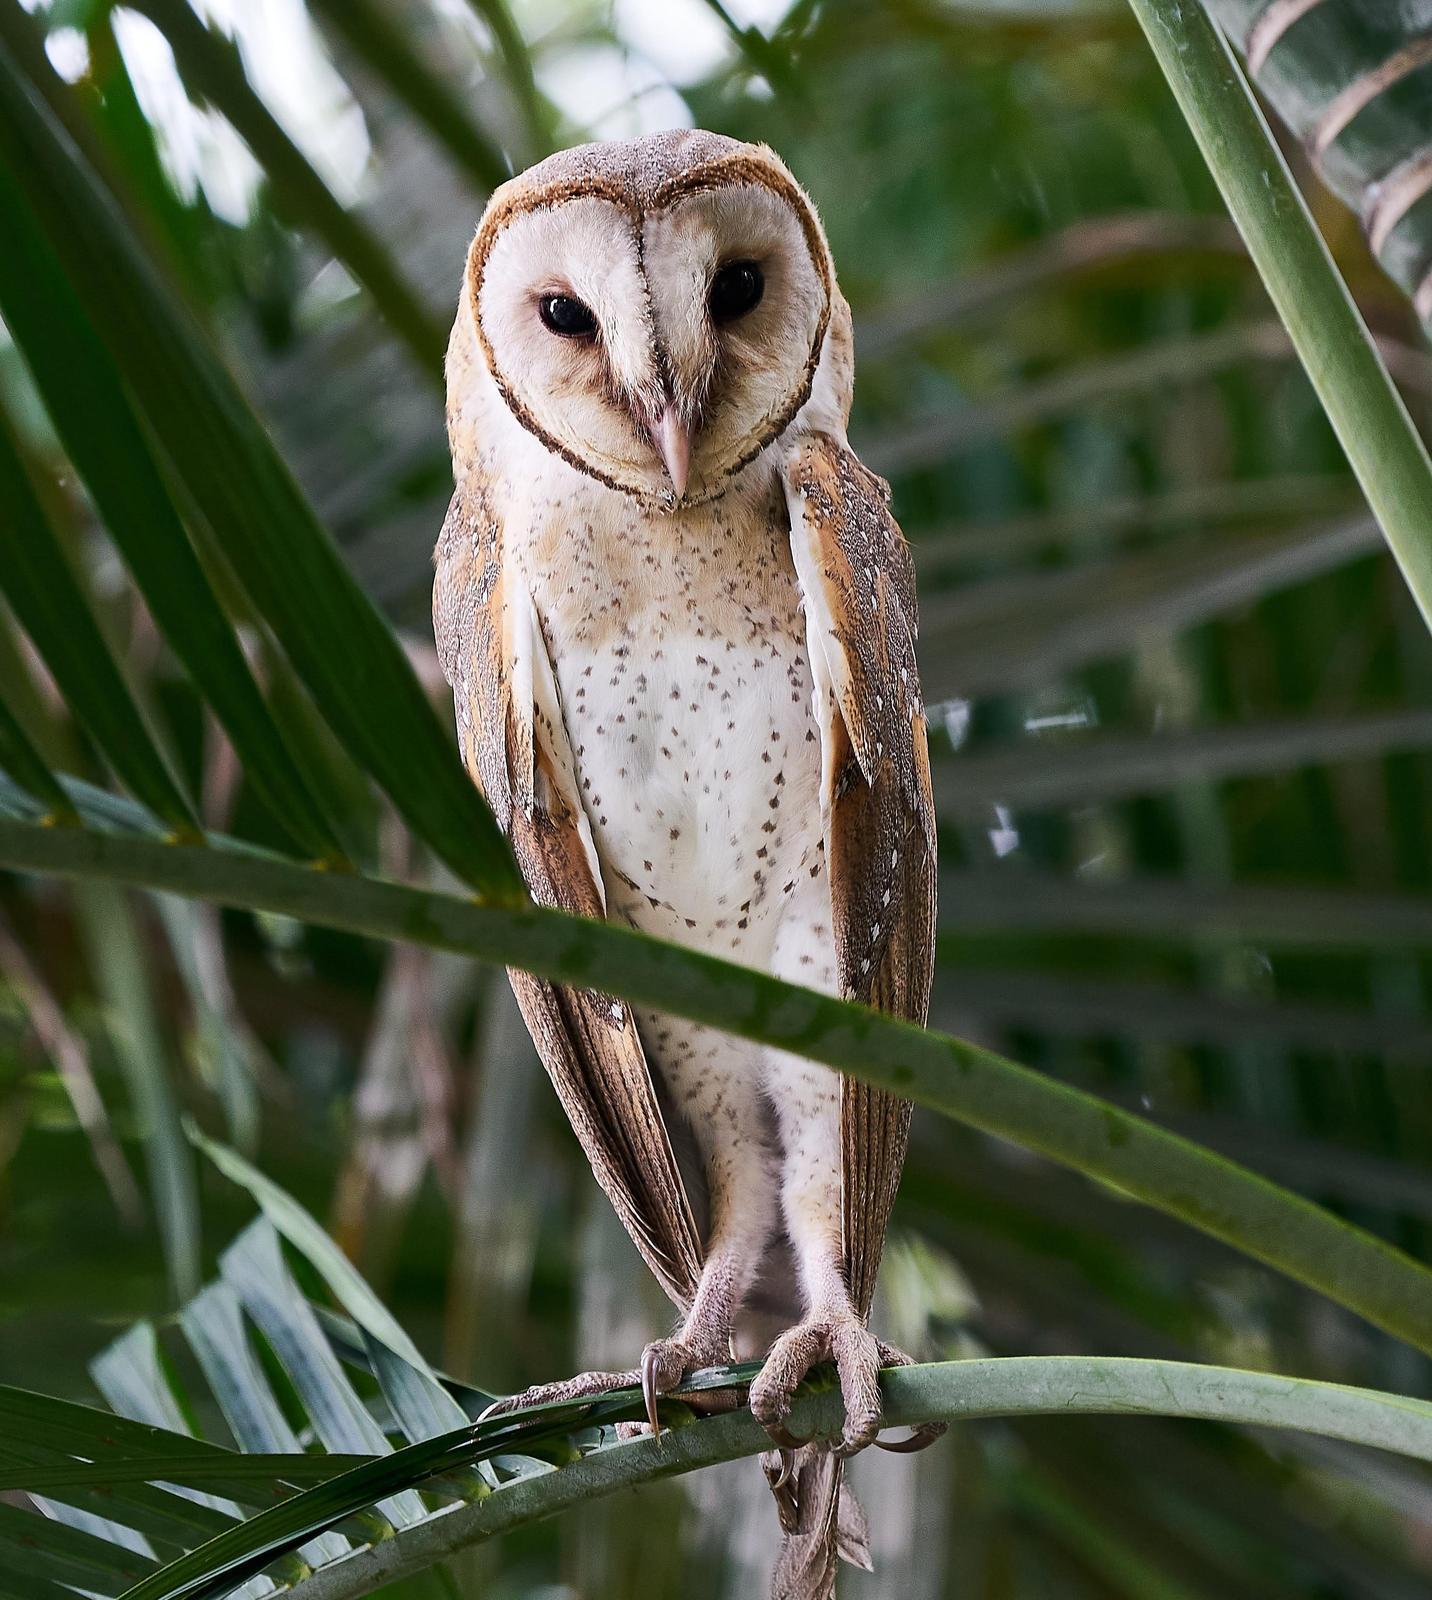 Barn Owl Photo by Steven Cheong